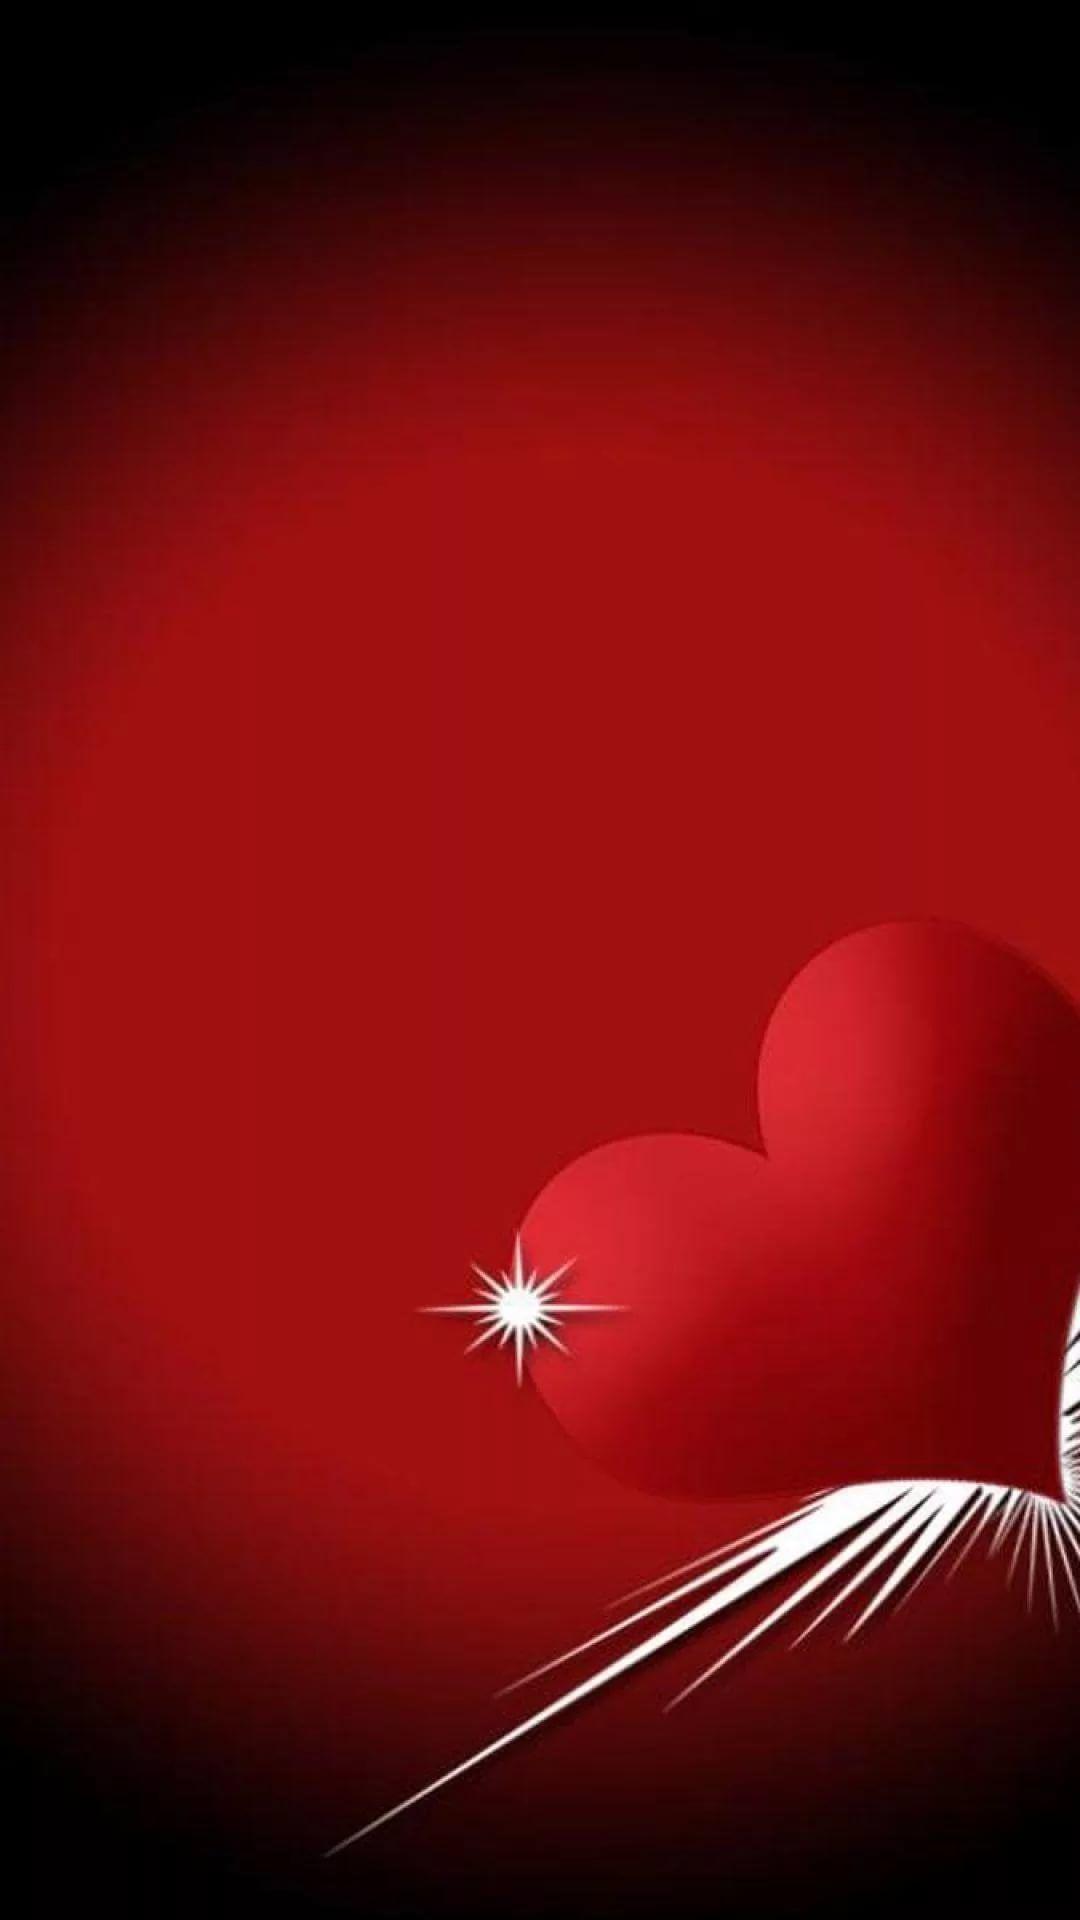 Valentine's Day hd wallpaper